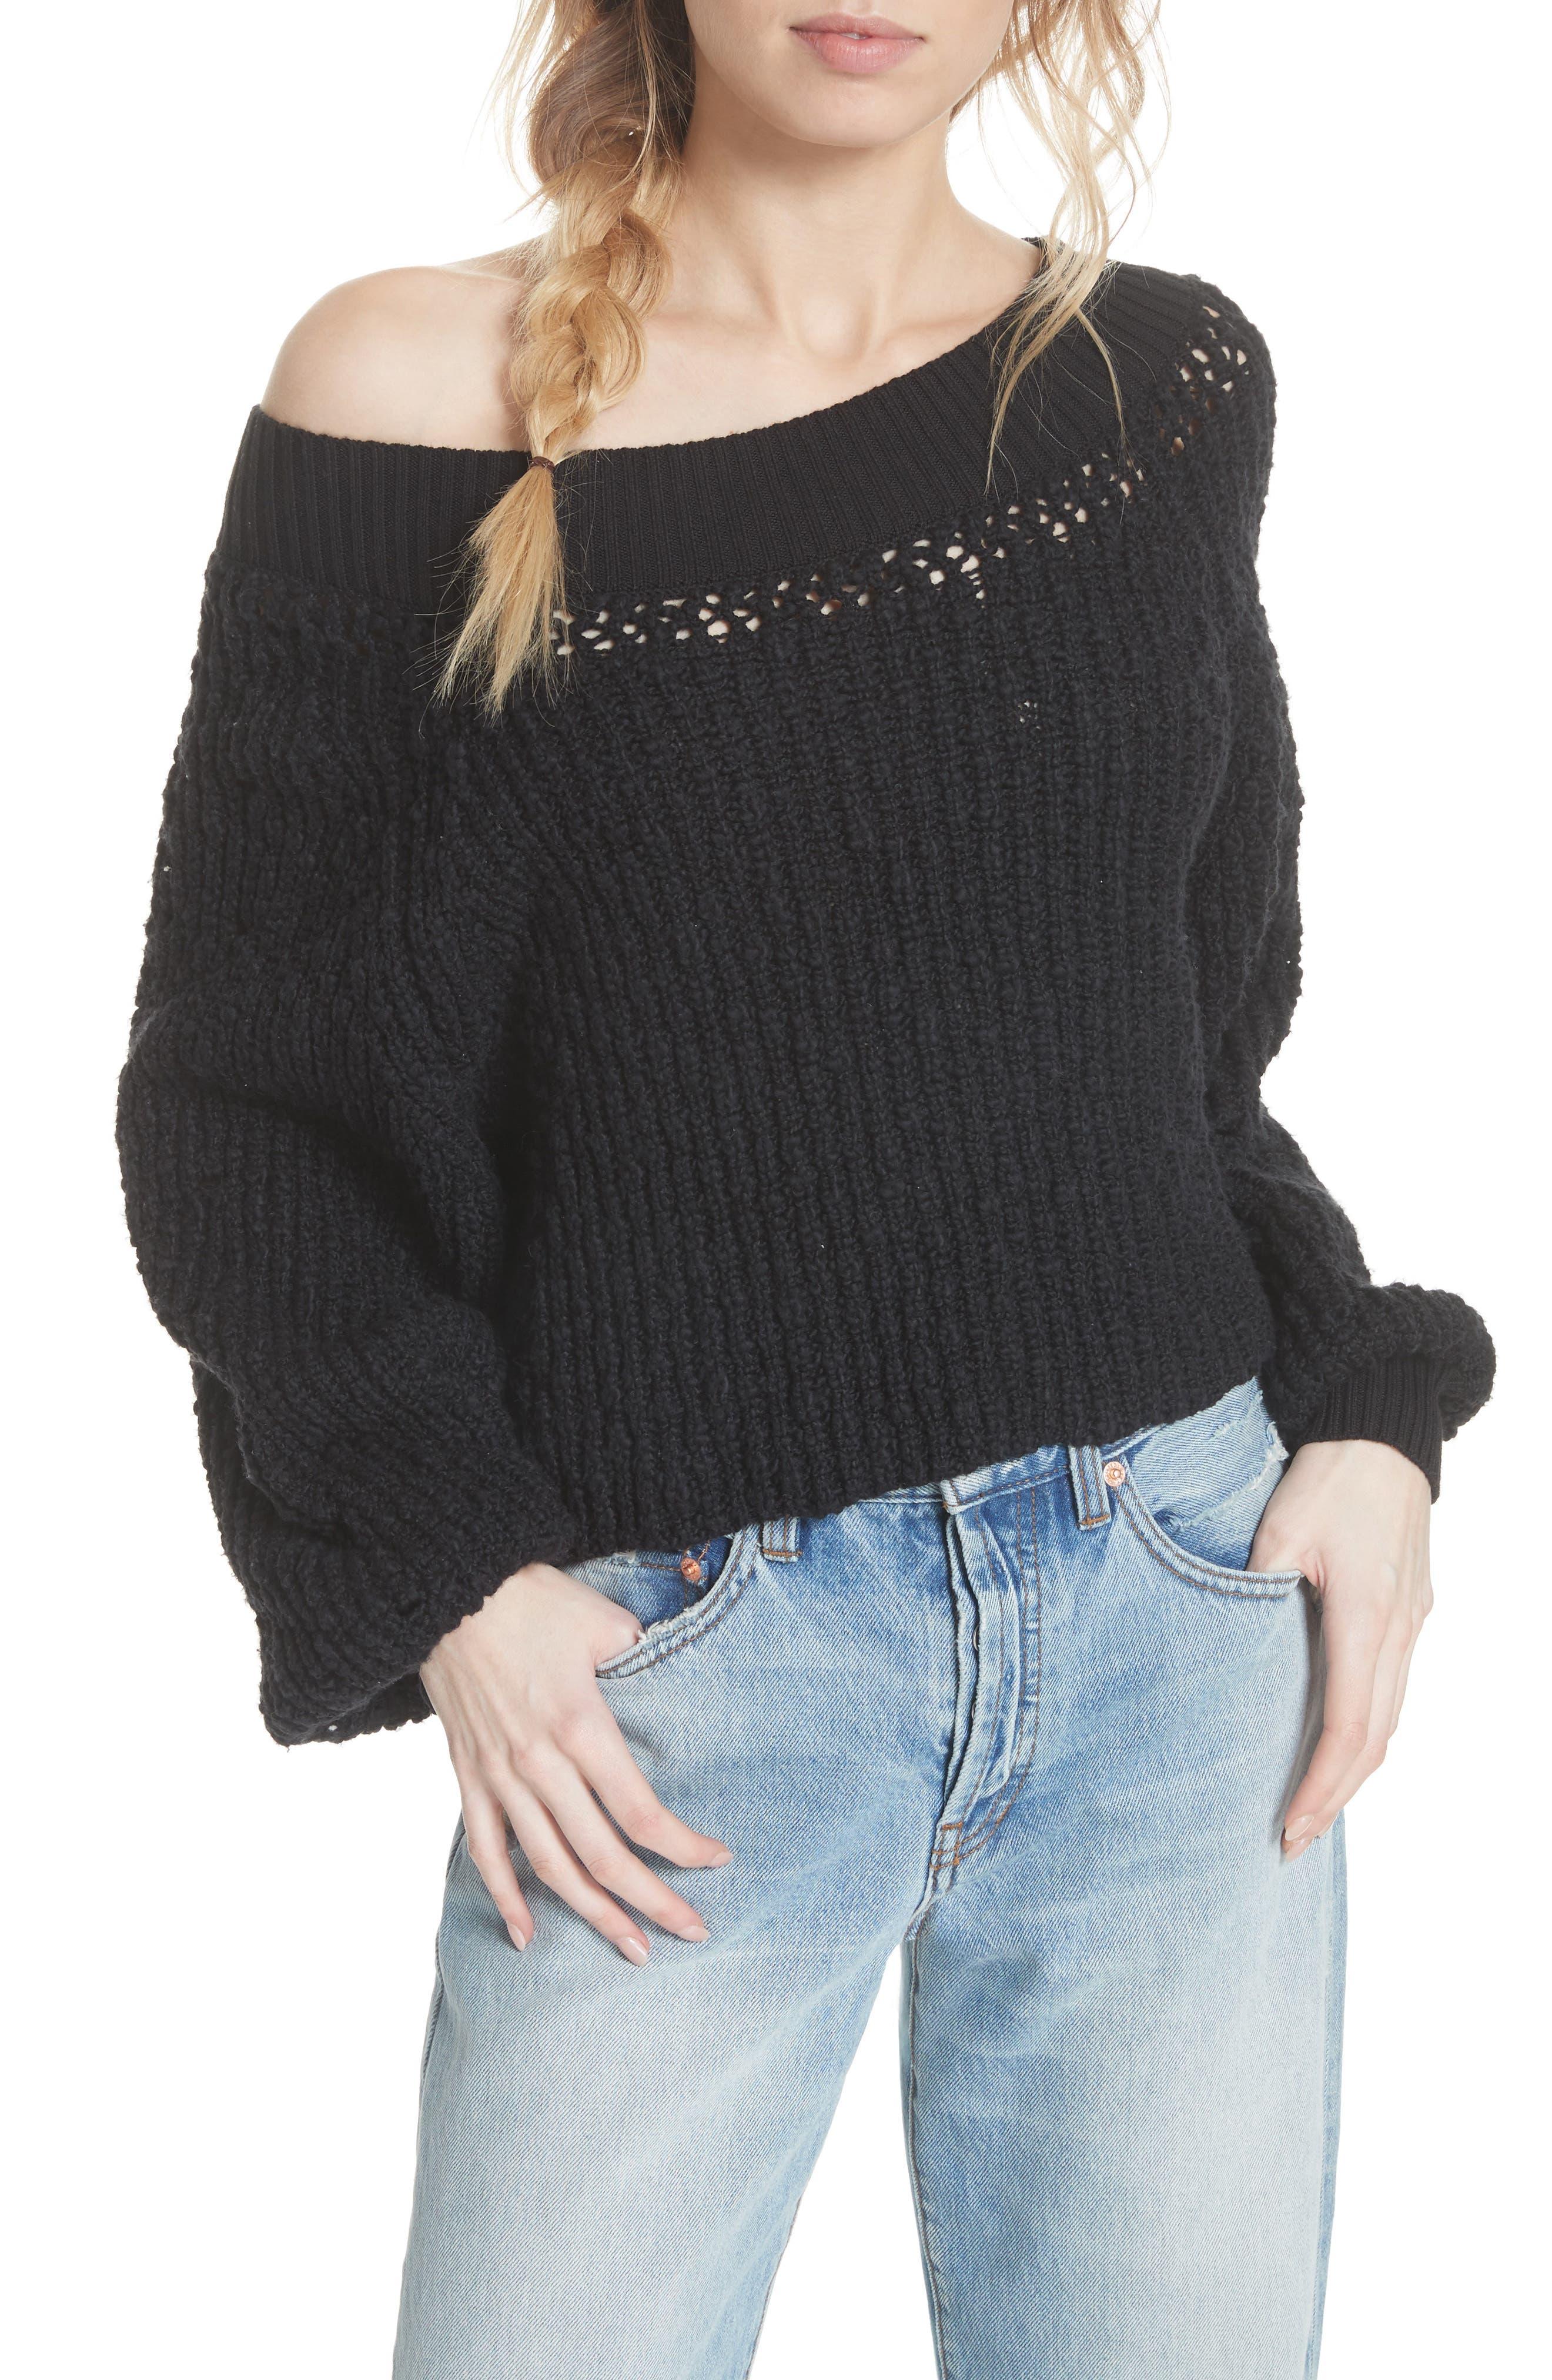 Pandora's Boatneck Sweater,                             Main thumbnail 1, color,                             001